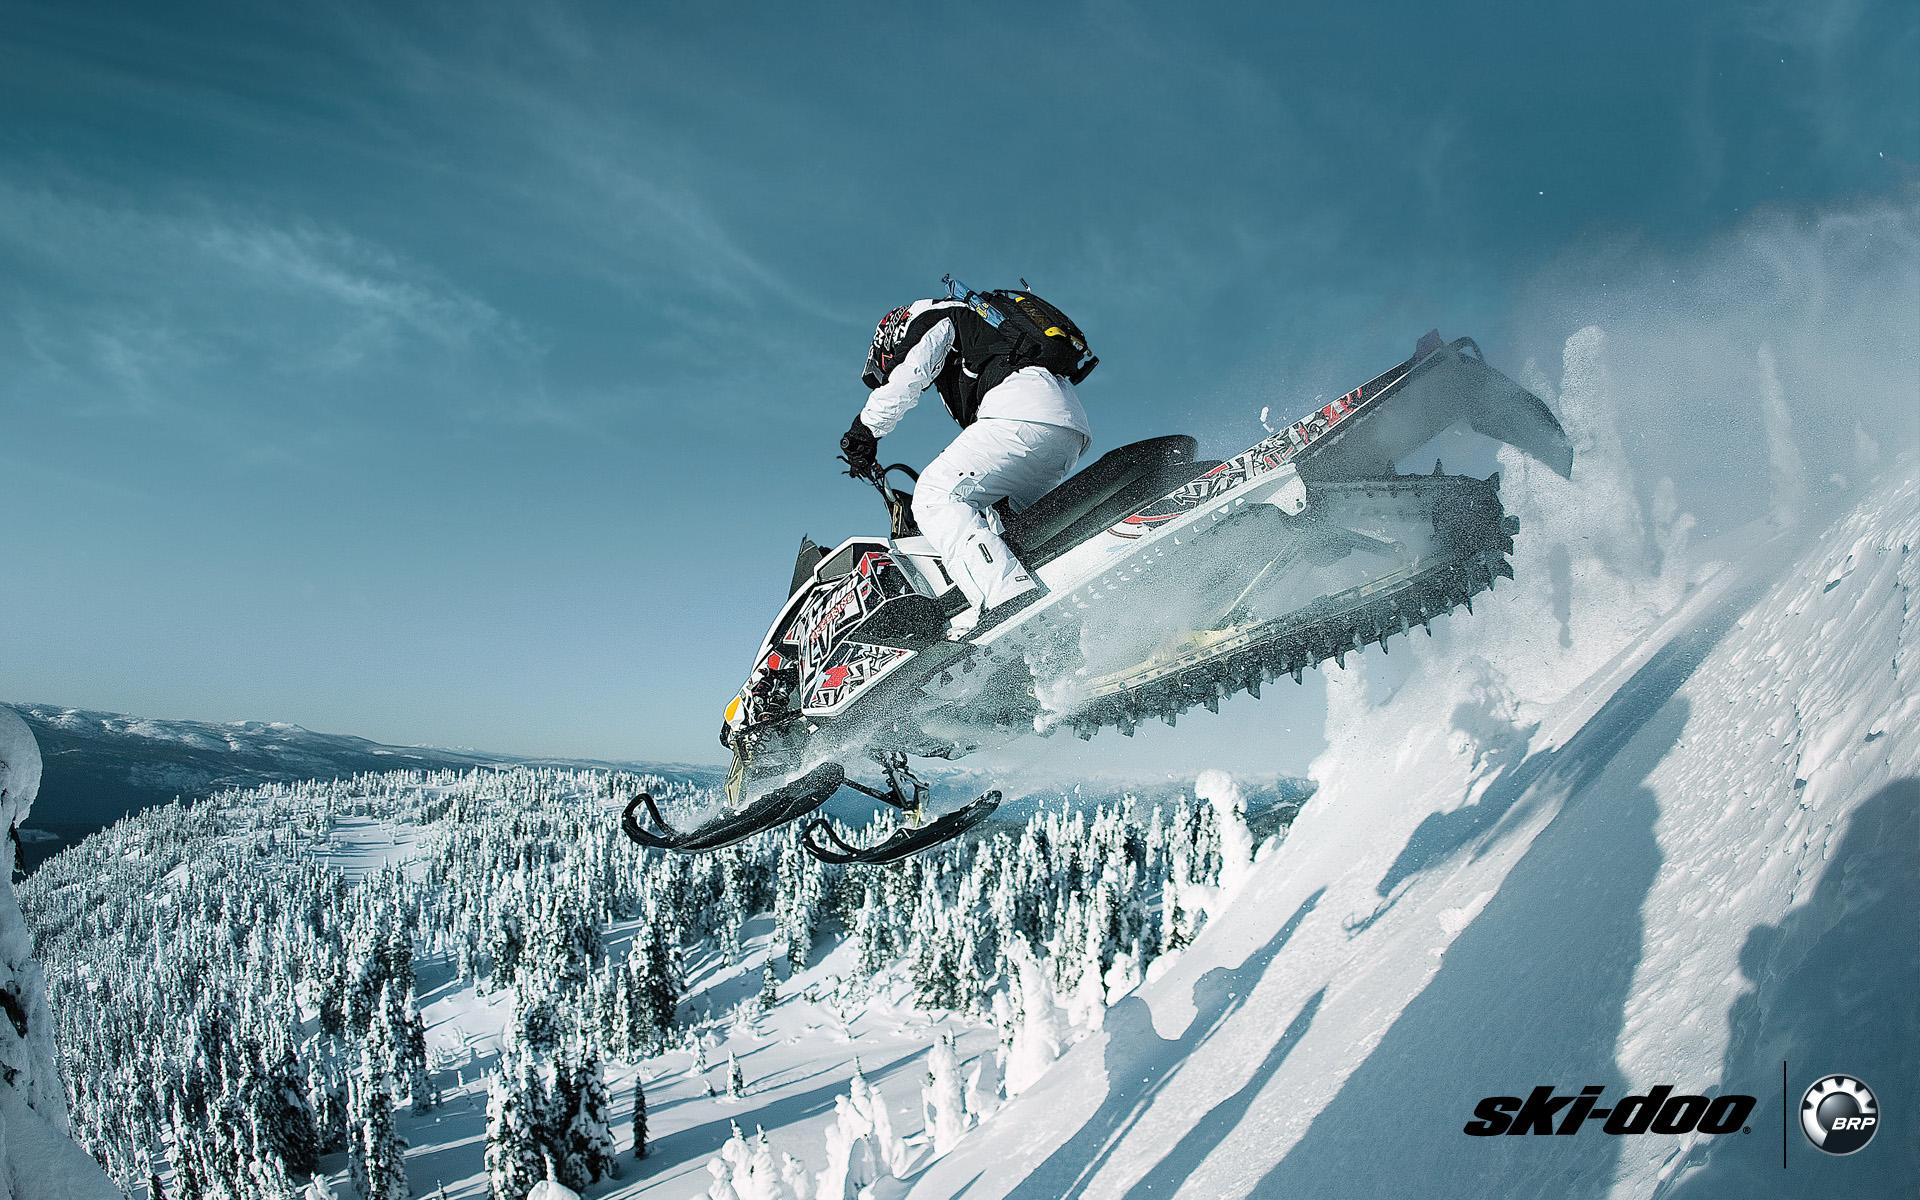 Ski Doo Background by Anthony Clayton on FeelGrafix 1920x1200